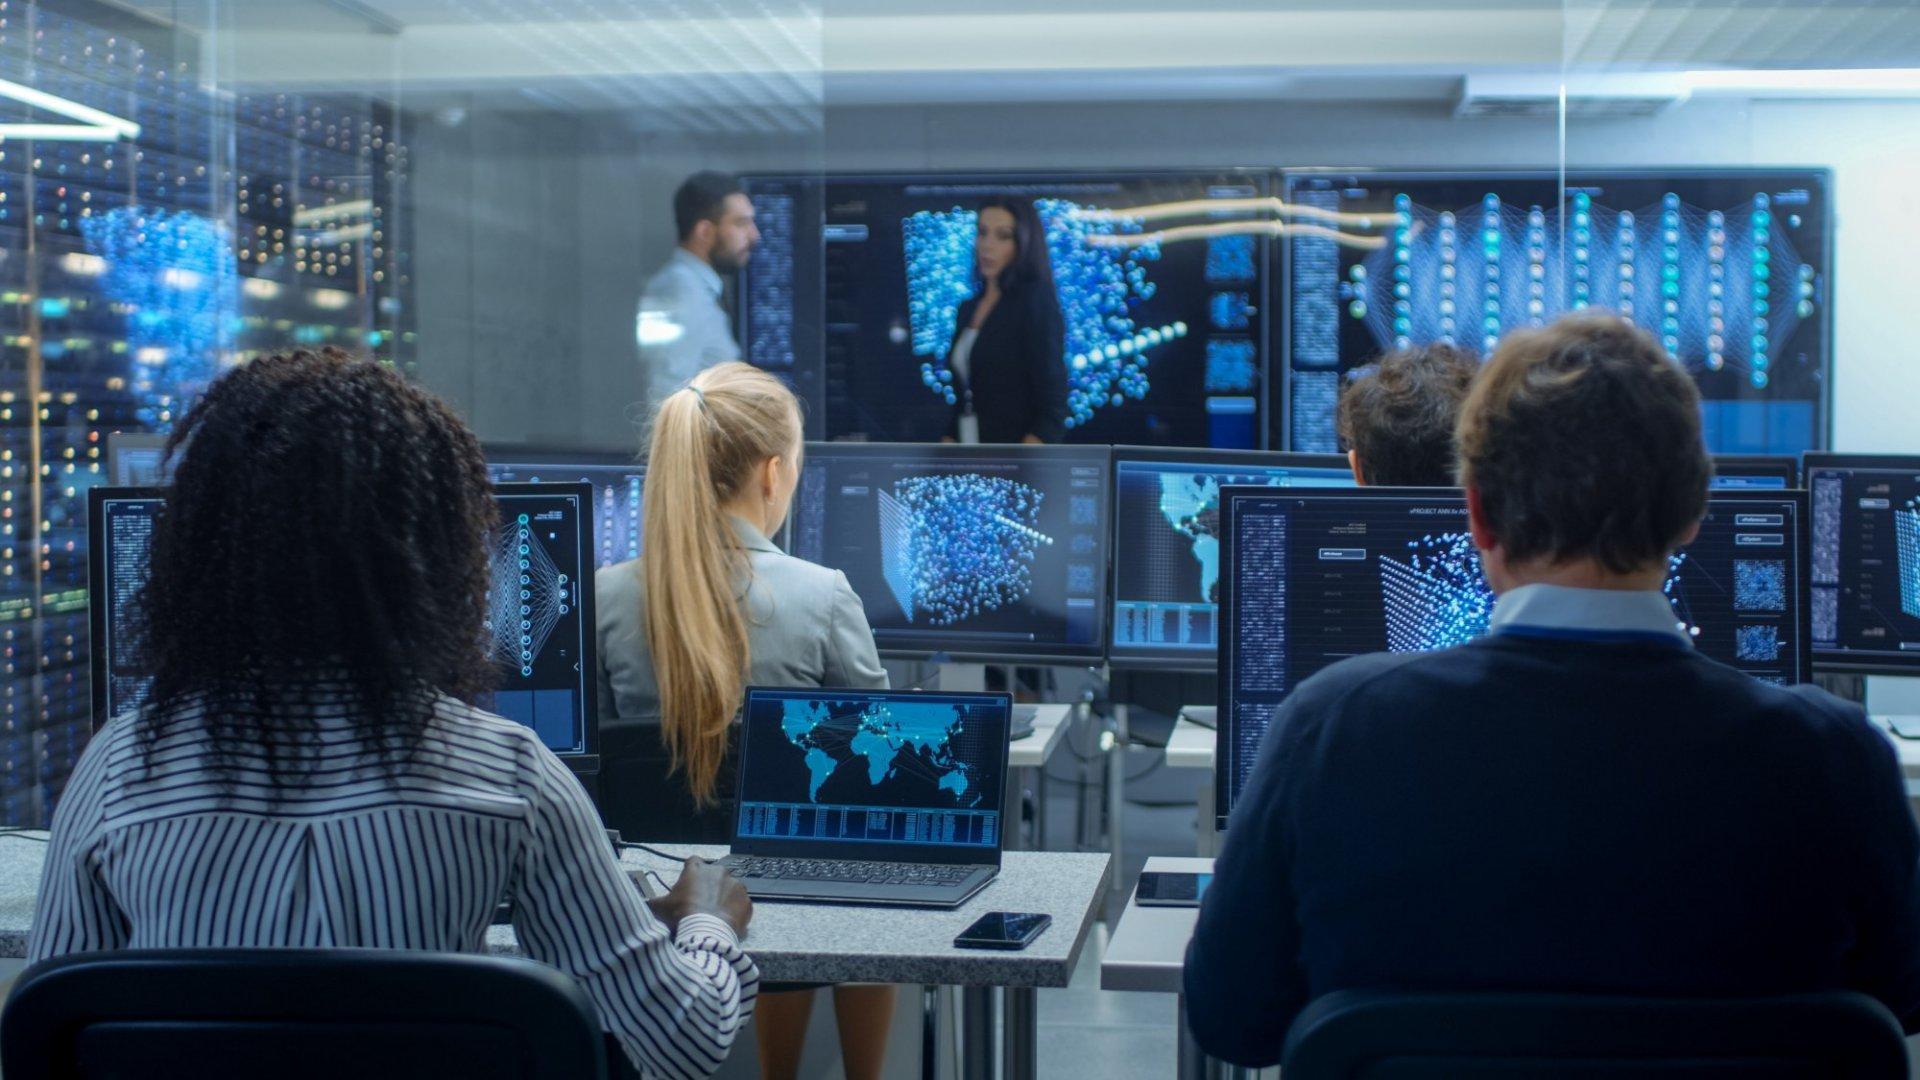 Atechup © Cybersecurity Entrepreneurship ™ Certification Bristol